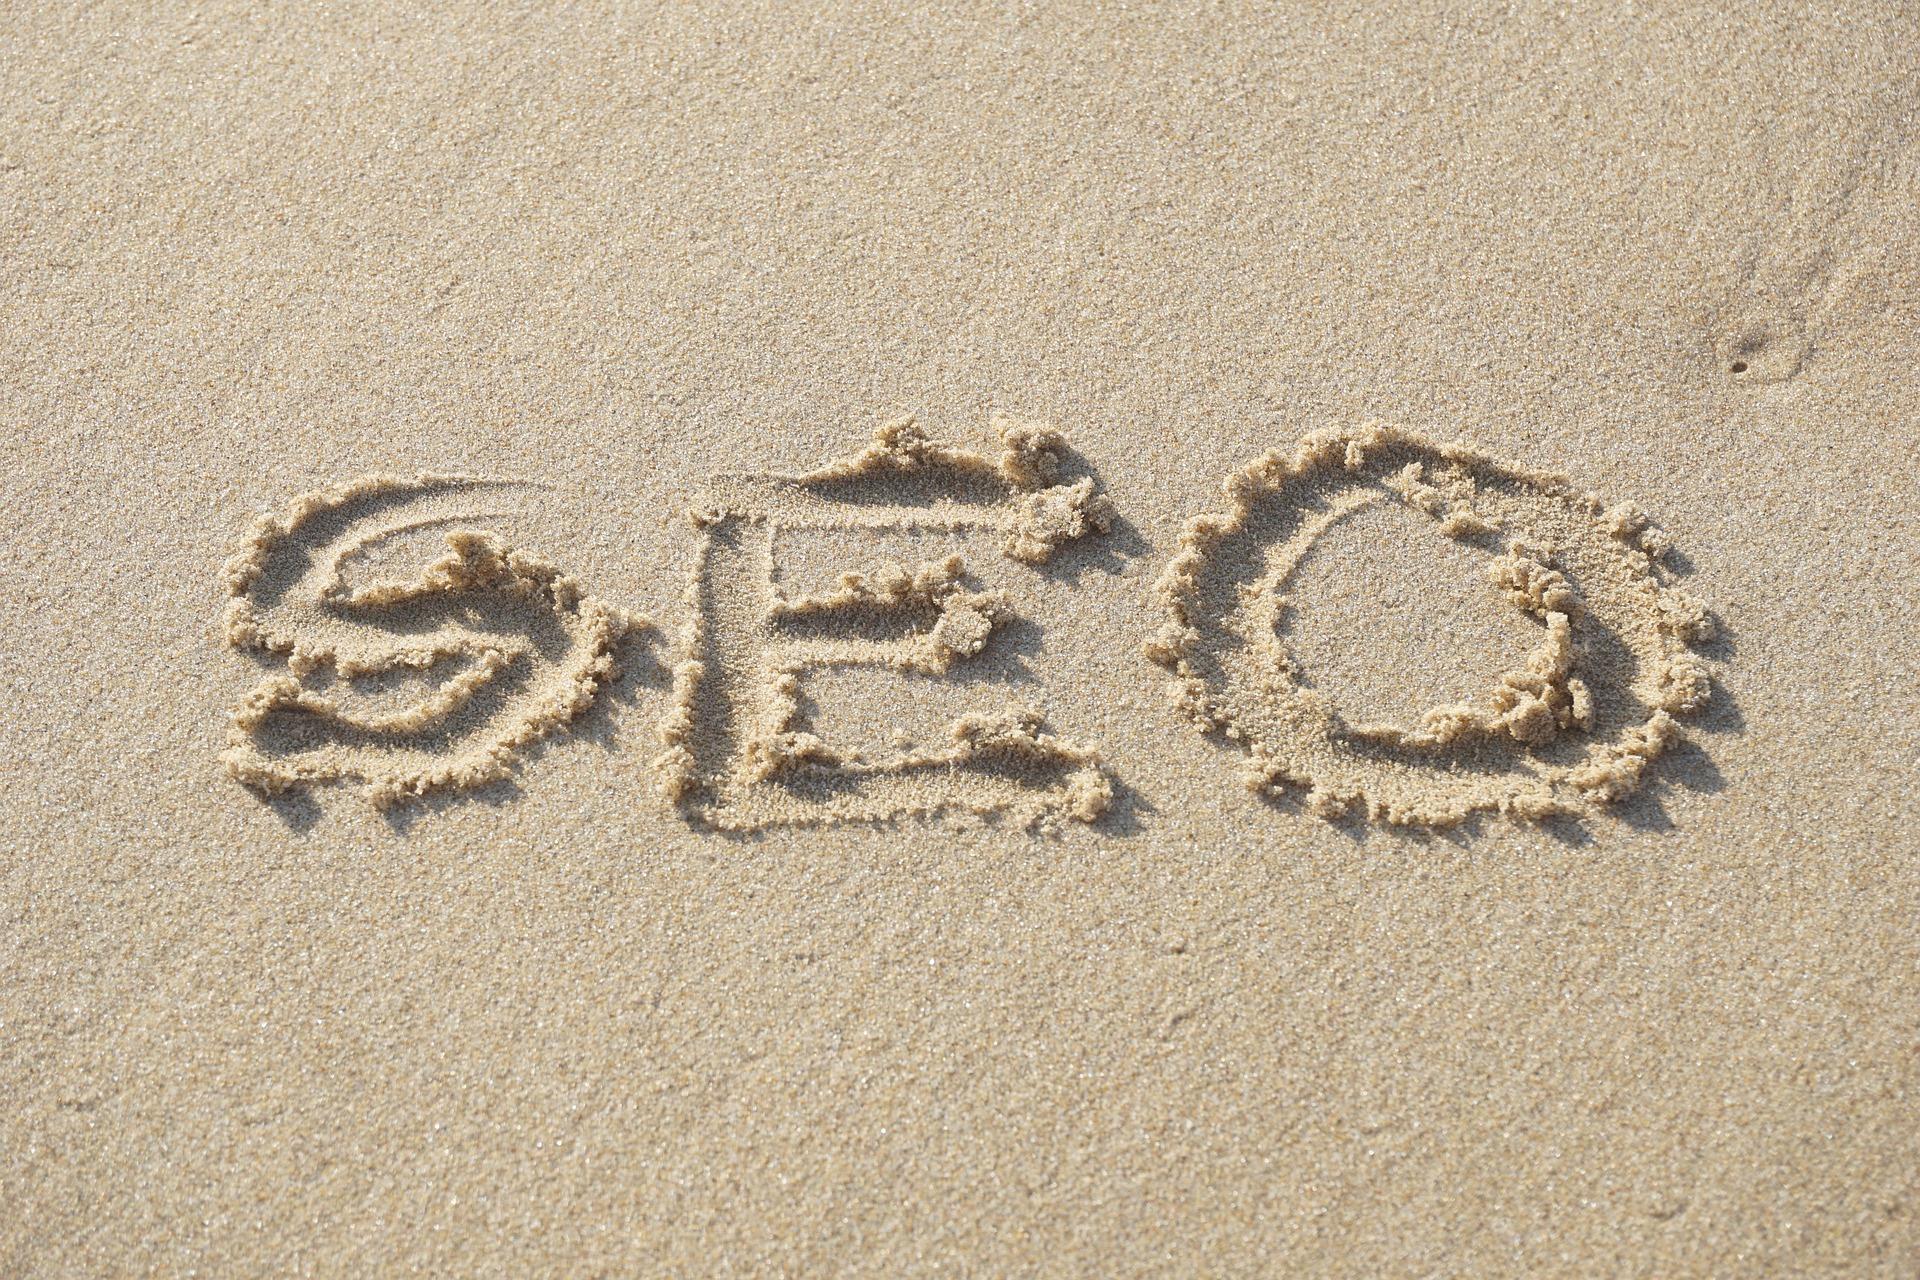 seo-avvocati-deontologia-internet